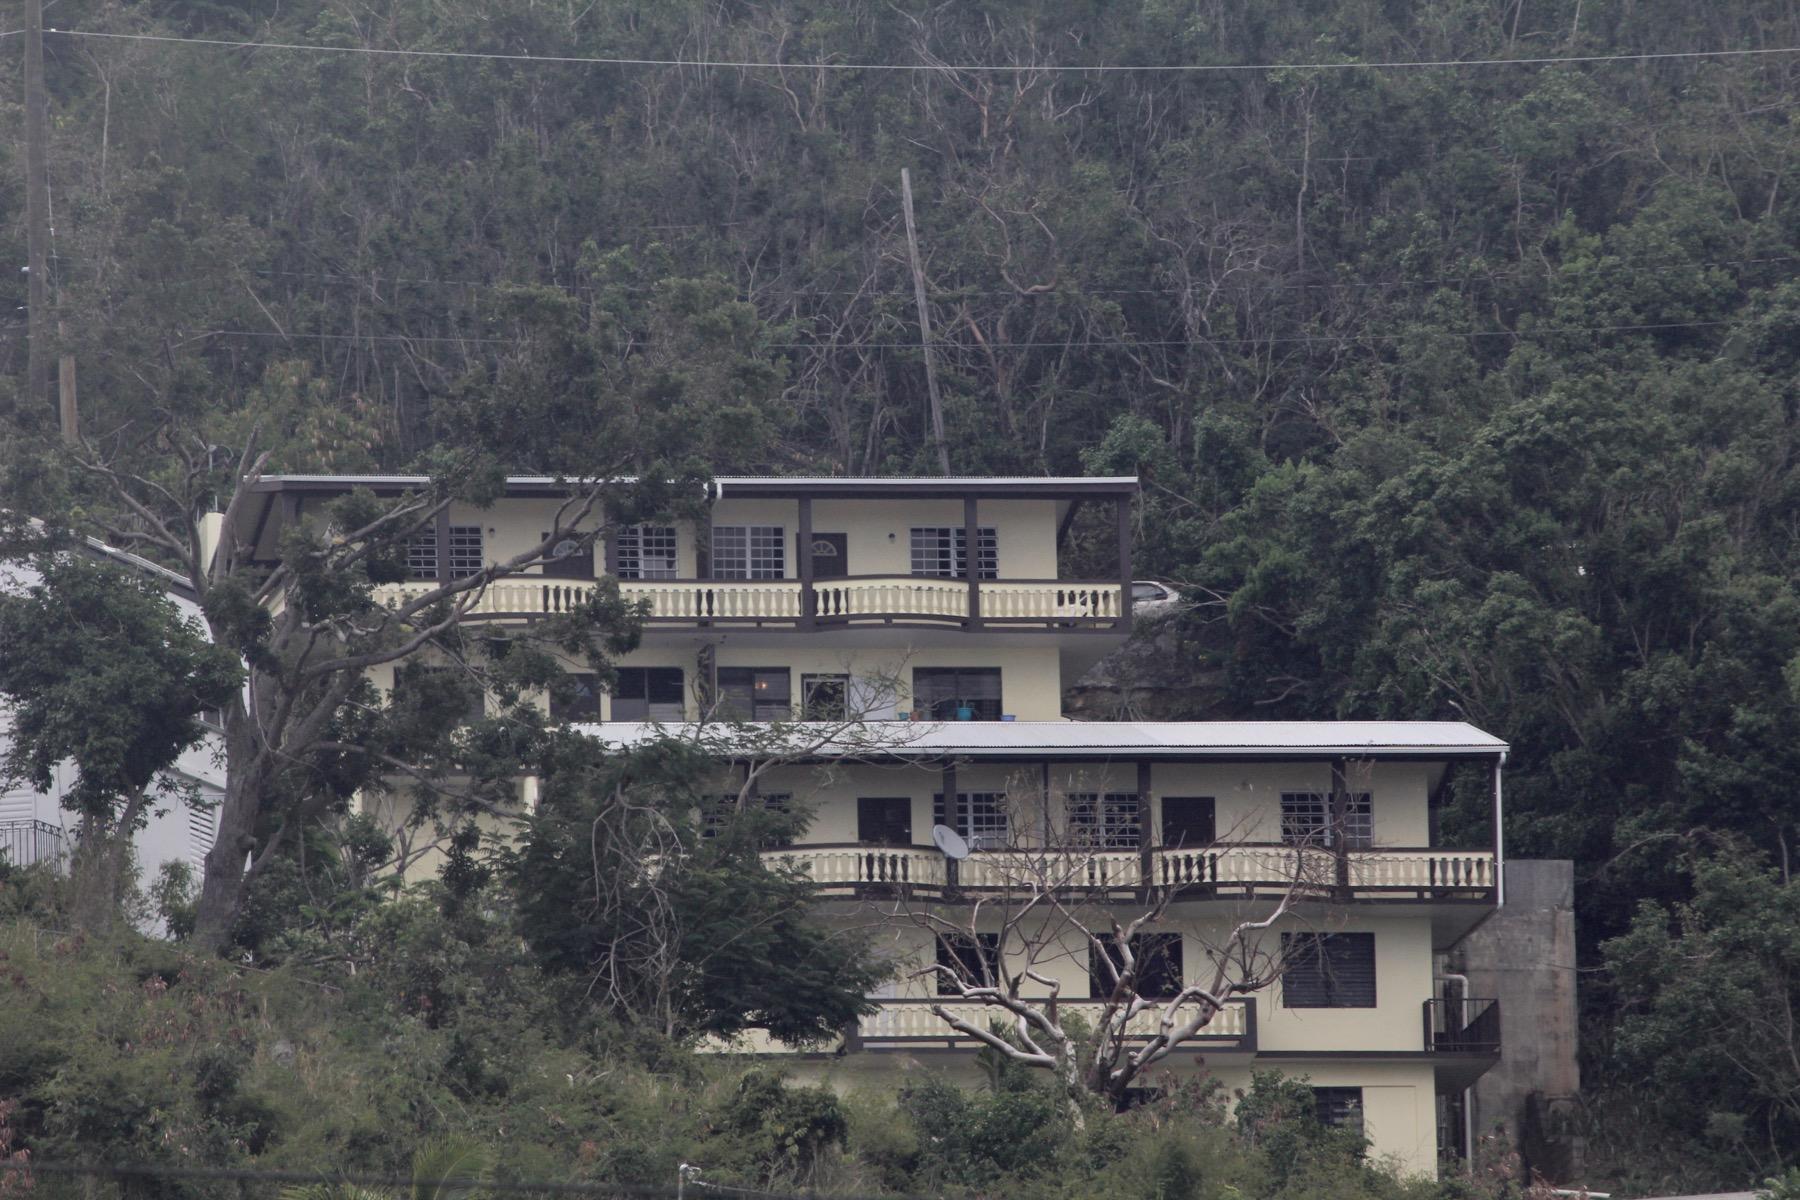 Multi-Family Home for Sale at 14RA Thomas NEW 14RA Thomas NEW St Thomas, Virgin Islands 00802 United States Virgin Islands